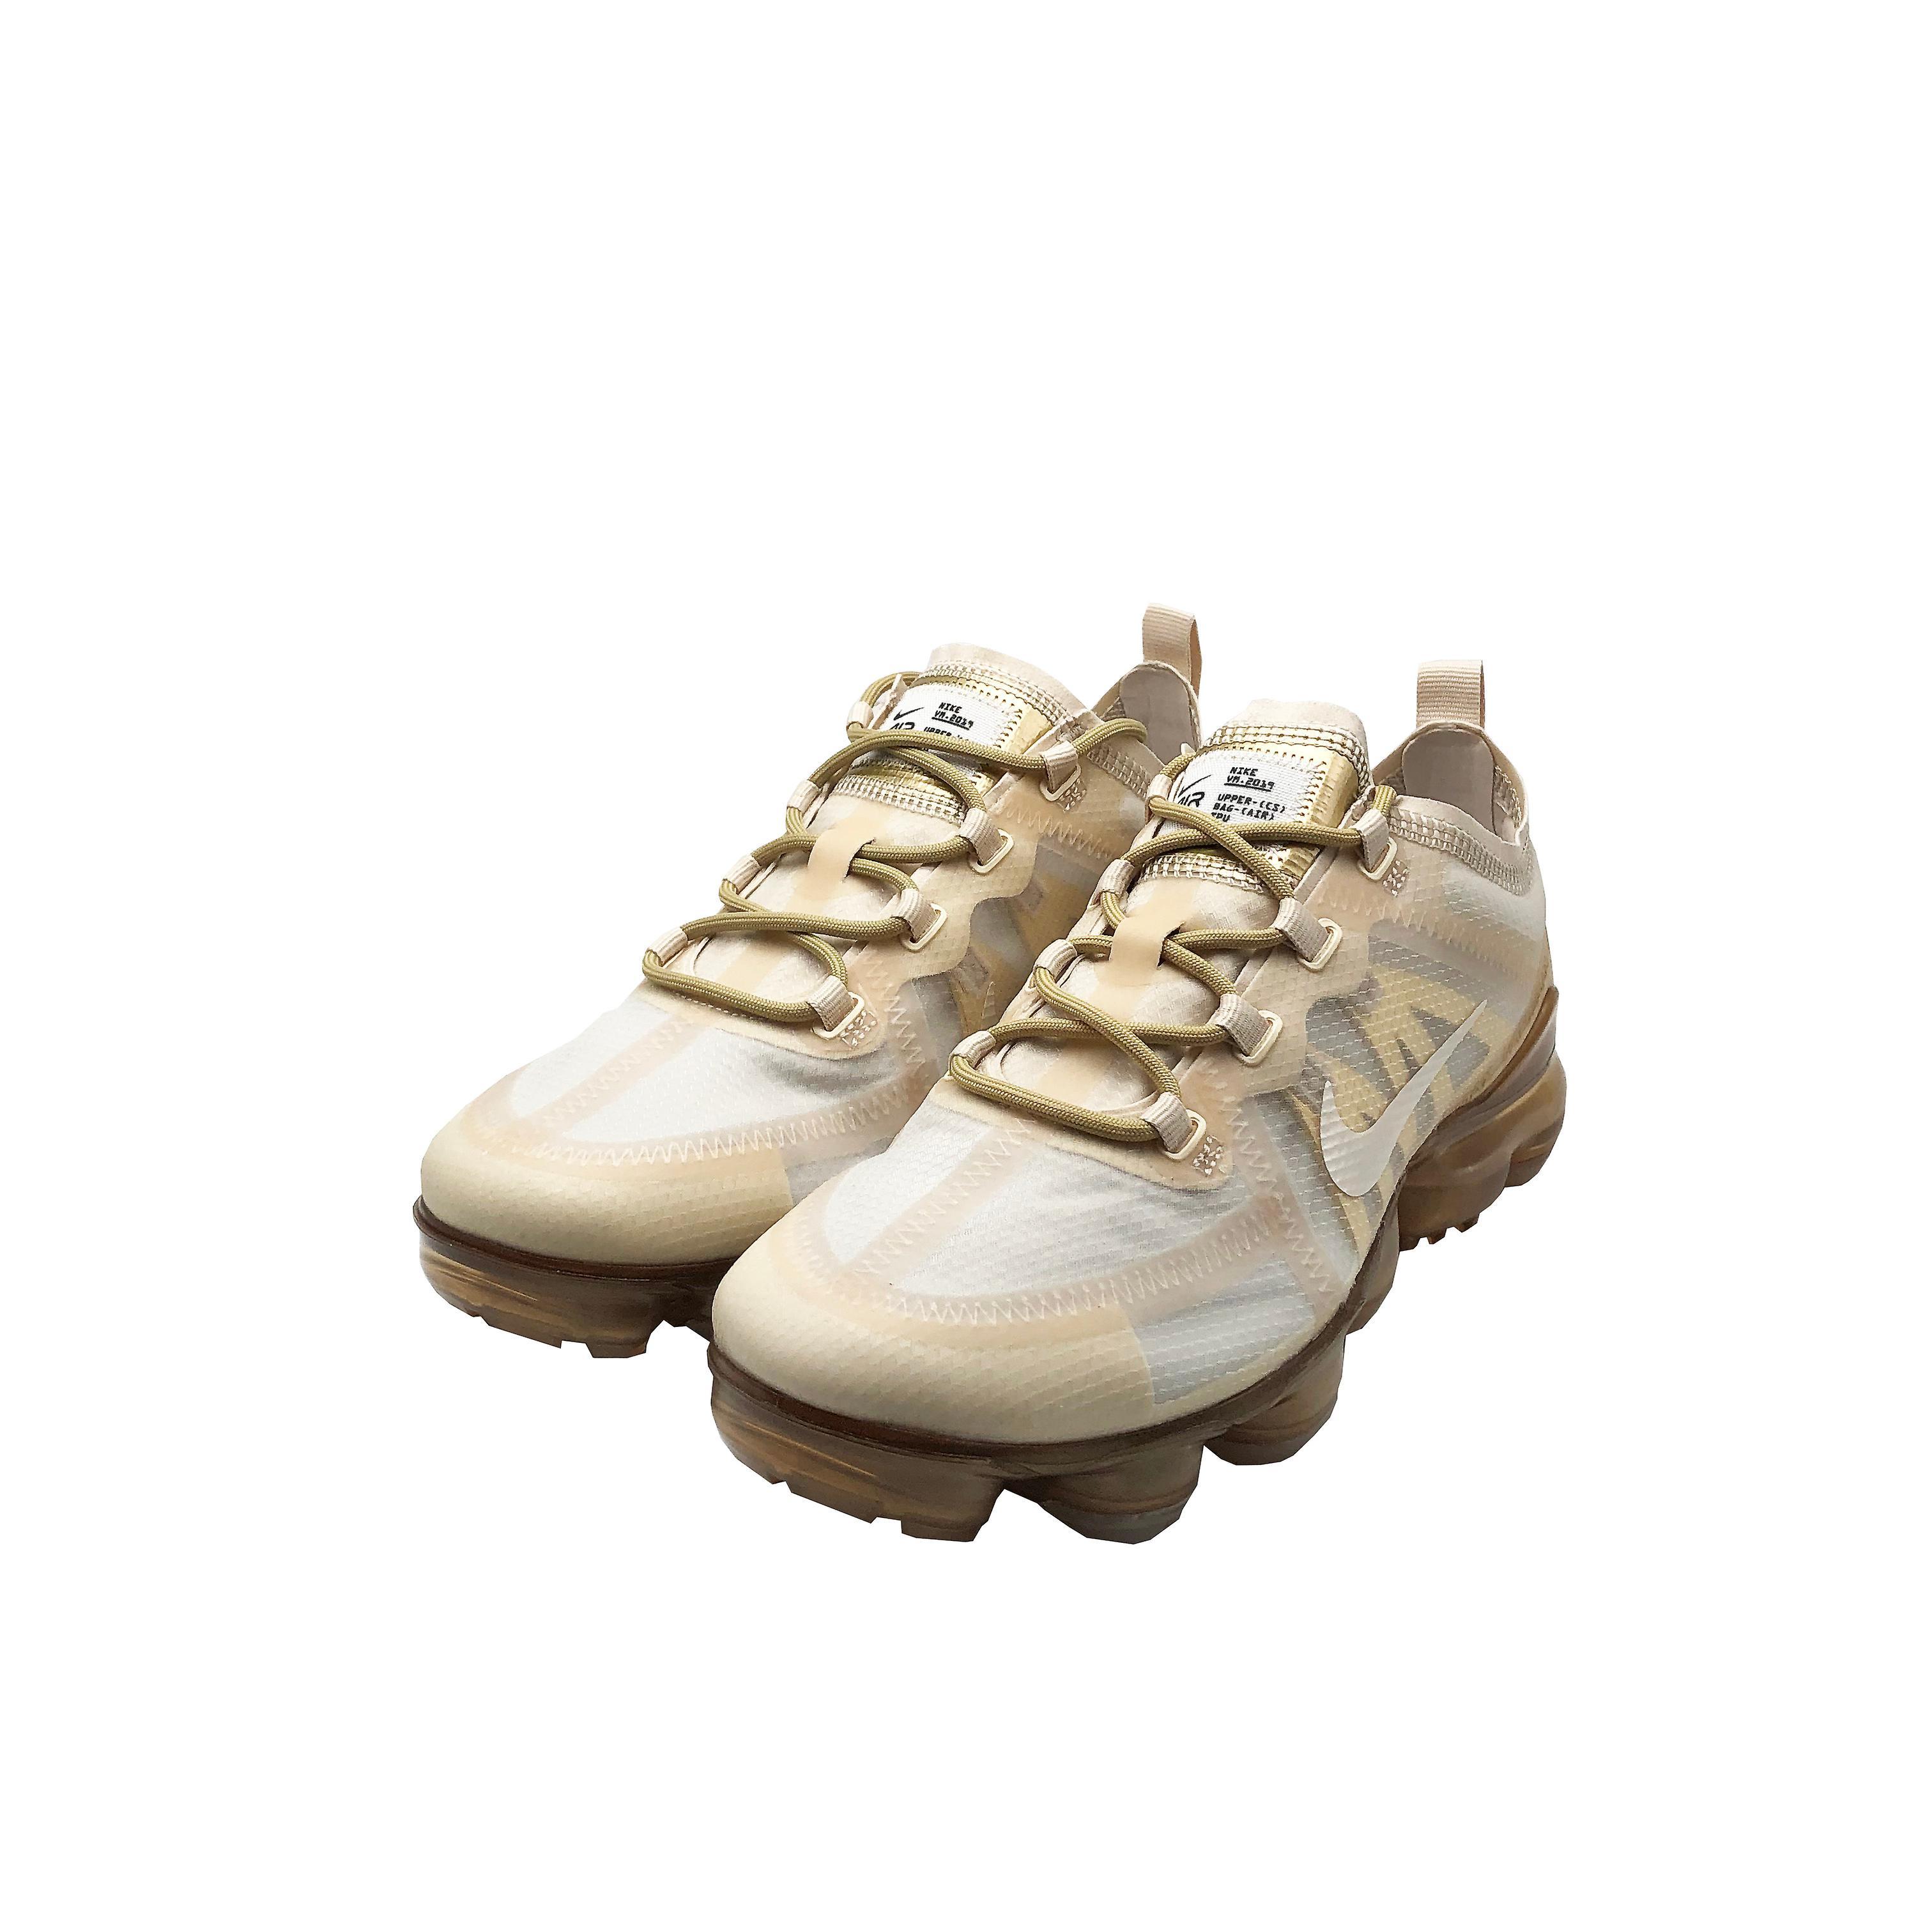 Nike Air Vapormax 2019 AR6632 101 dam tränings skor